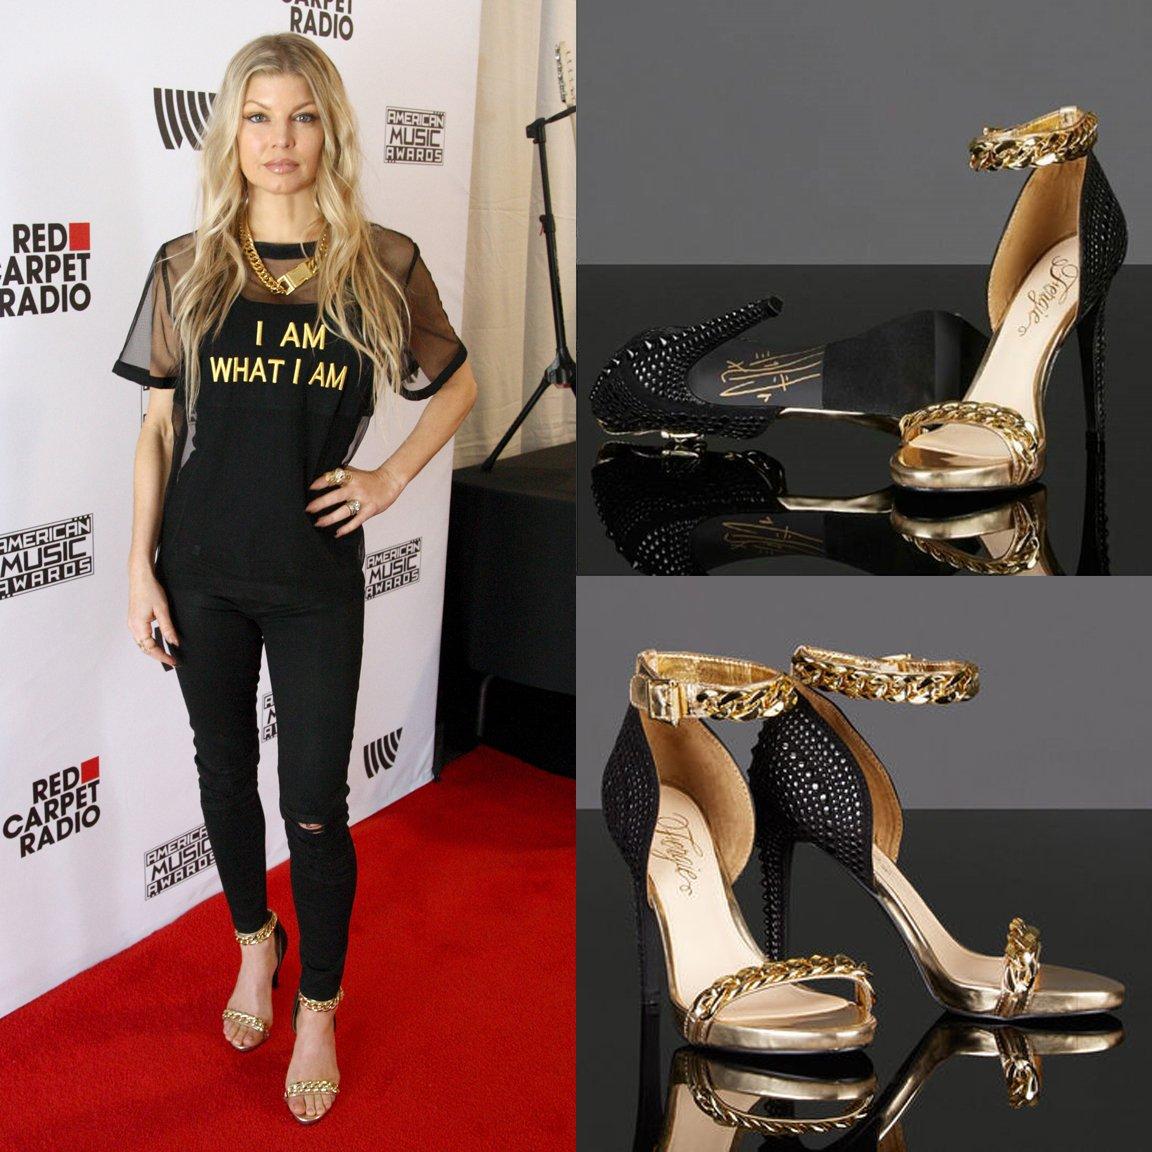 RT @FergieFootwear: BID on @SmallStepsDocs #CelebrityShoeAuction 4 @Fergie sandals https://t.co/1w89vZsHyu 2 help kids on rubbish dumps. ht…